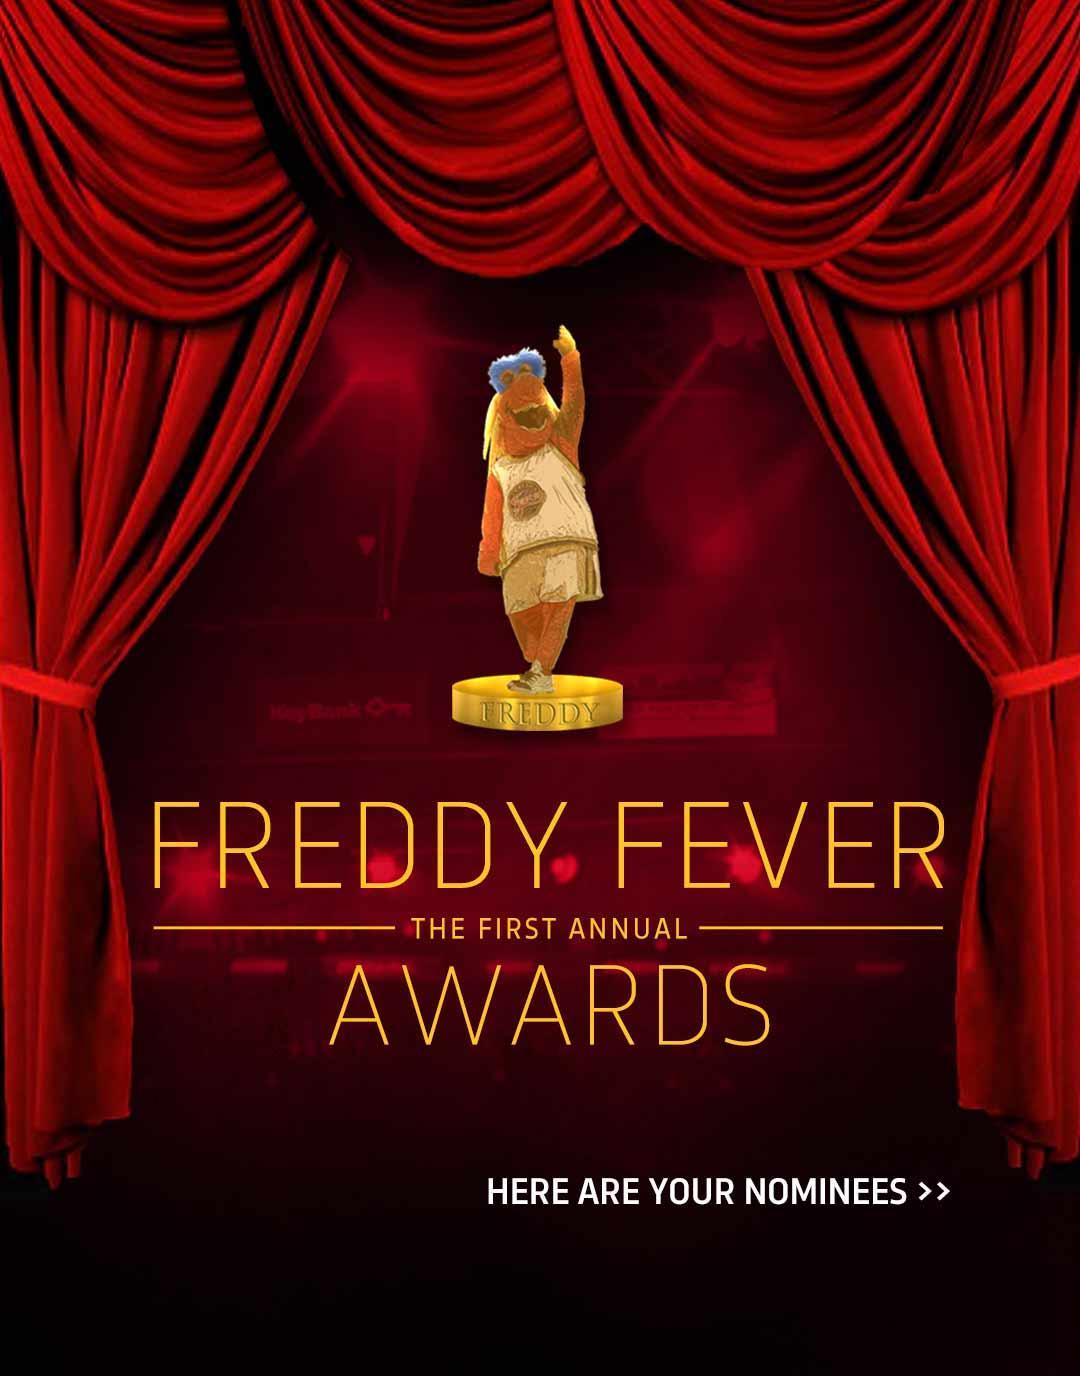 2016 Freddy Fever Awards: Nominees